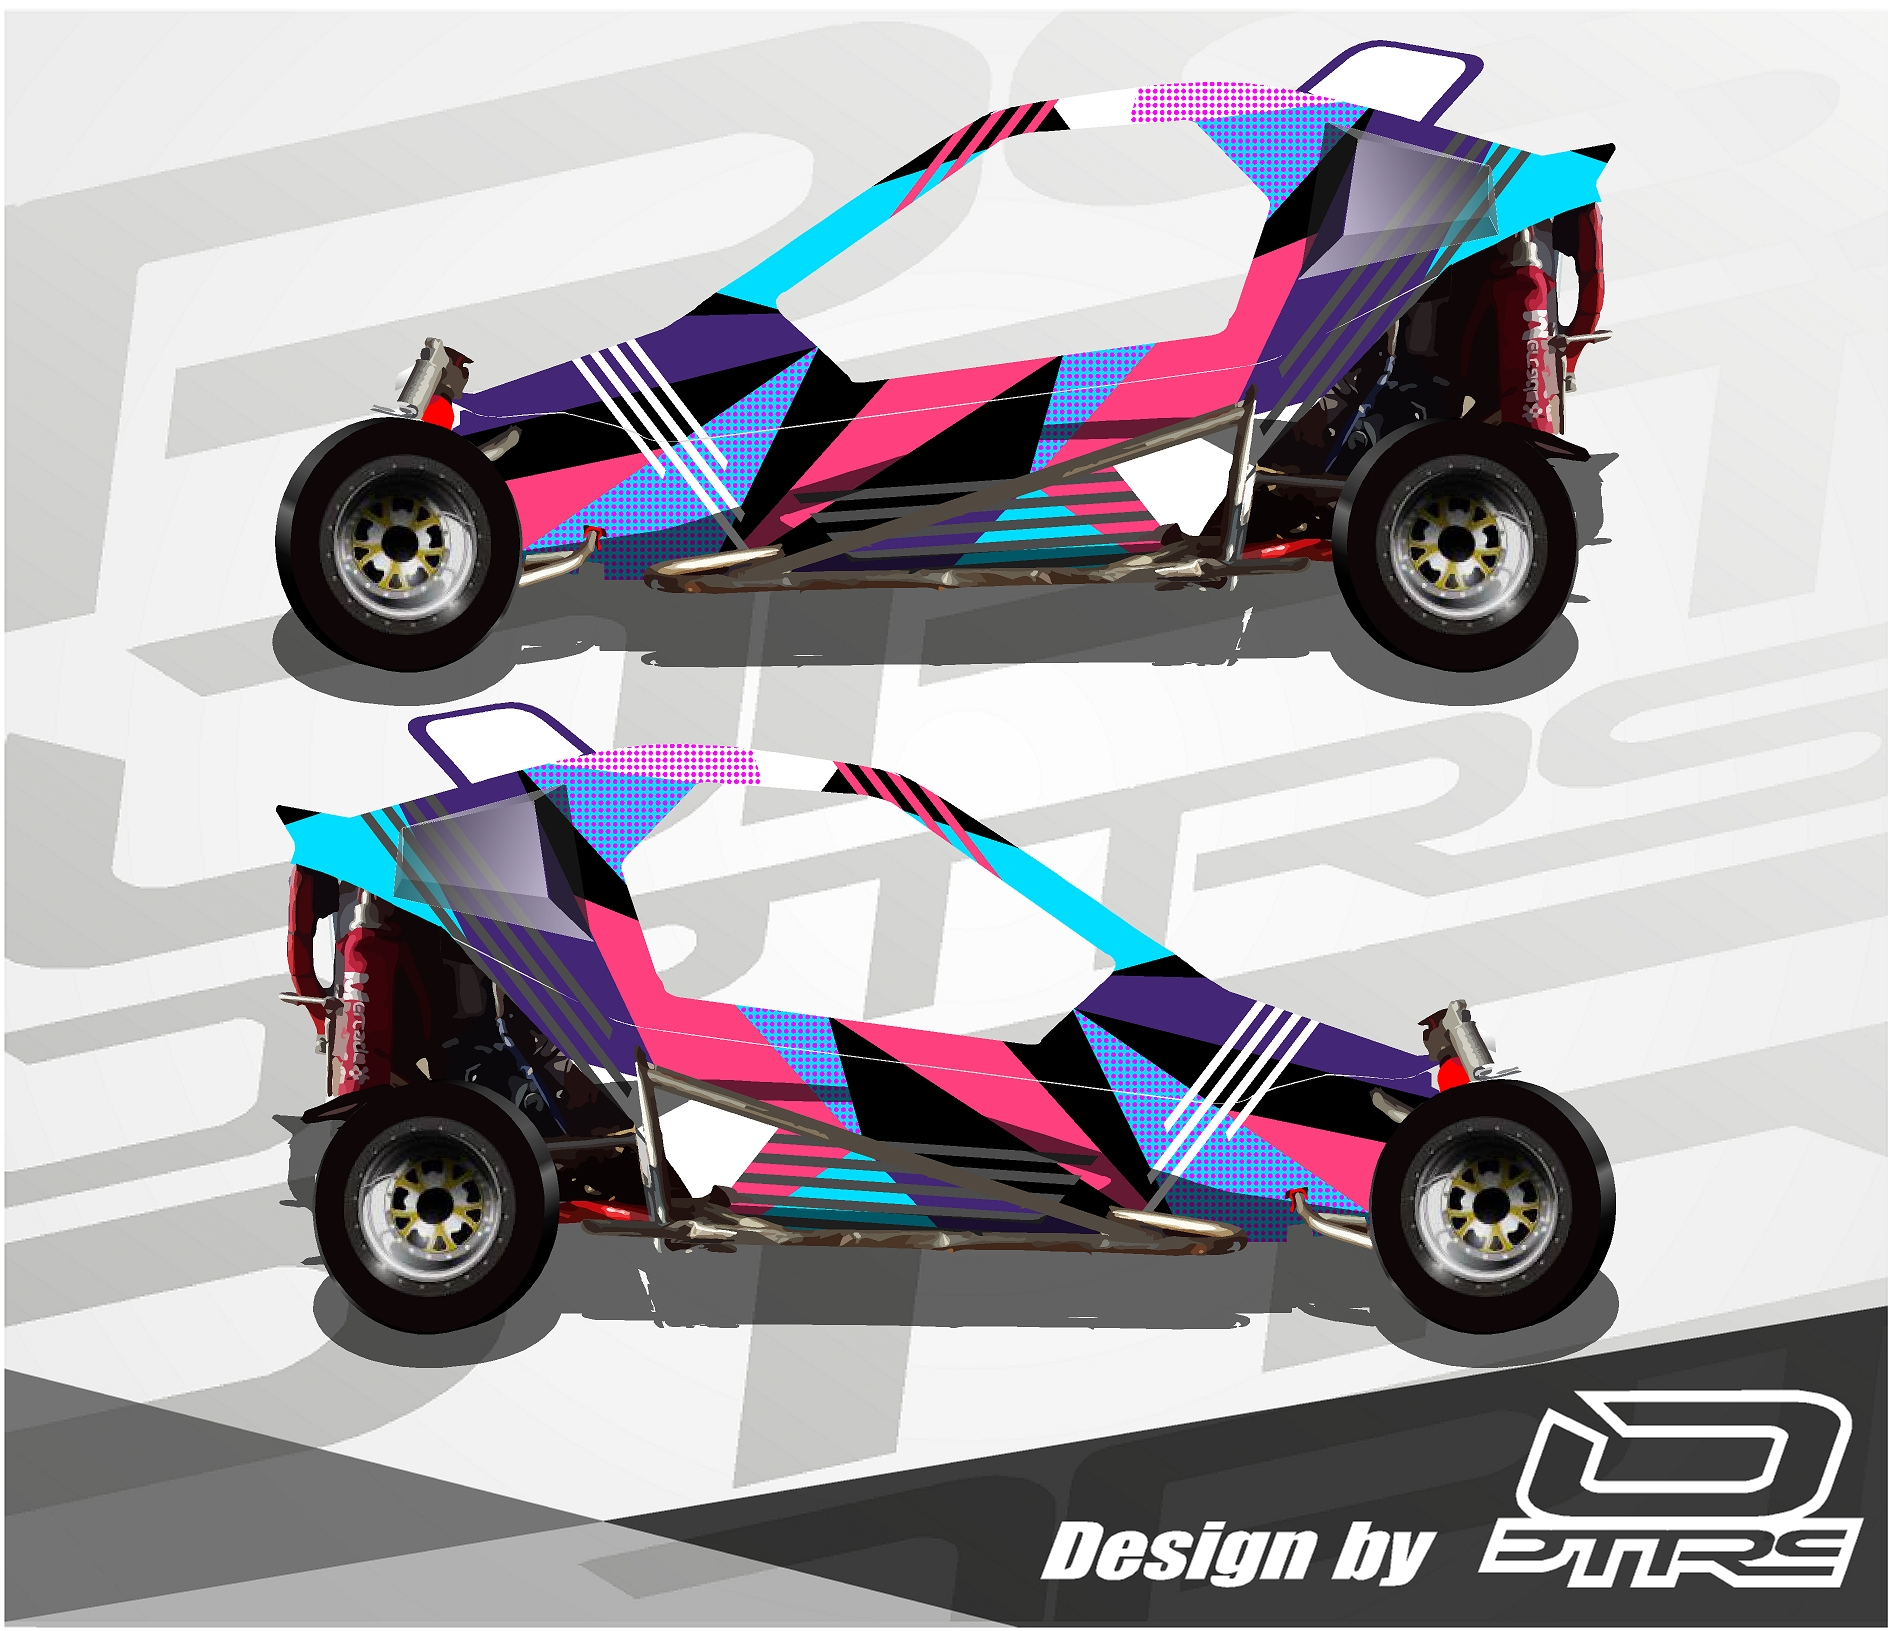 Carcross Full Design Purplepink